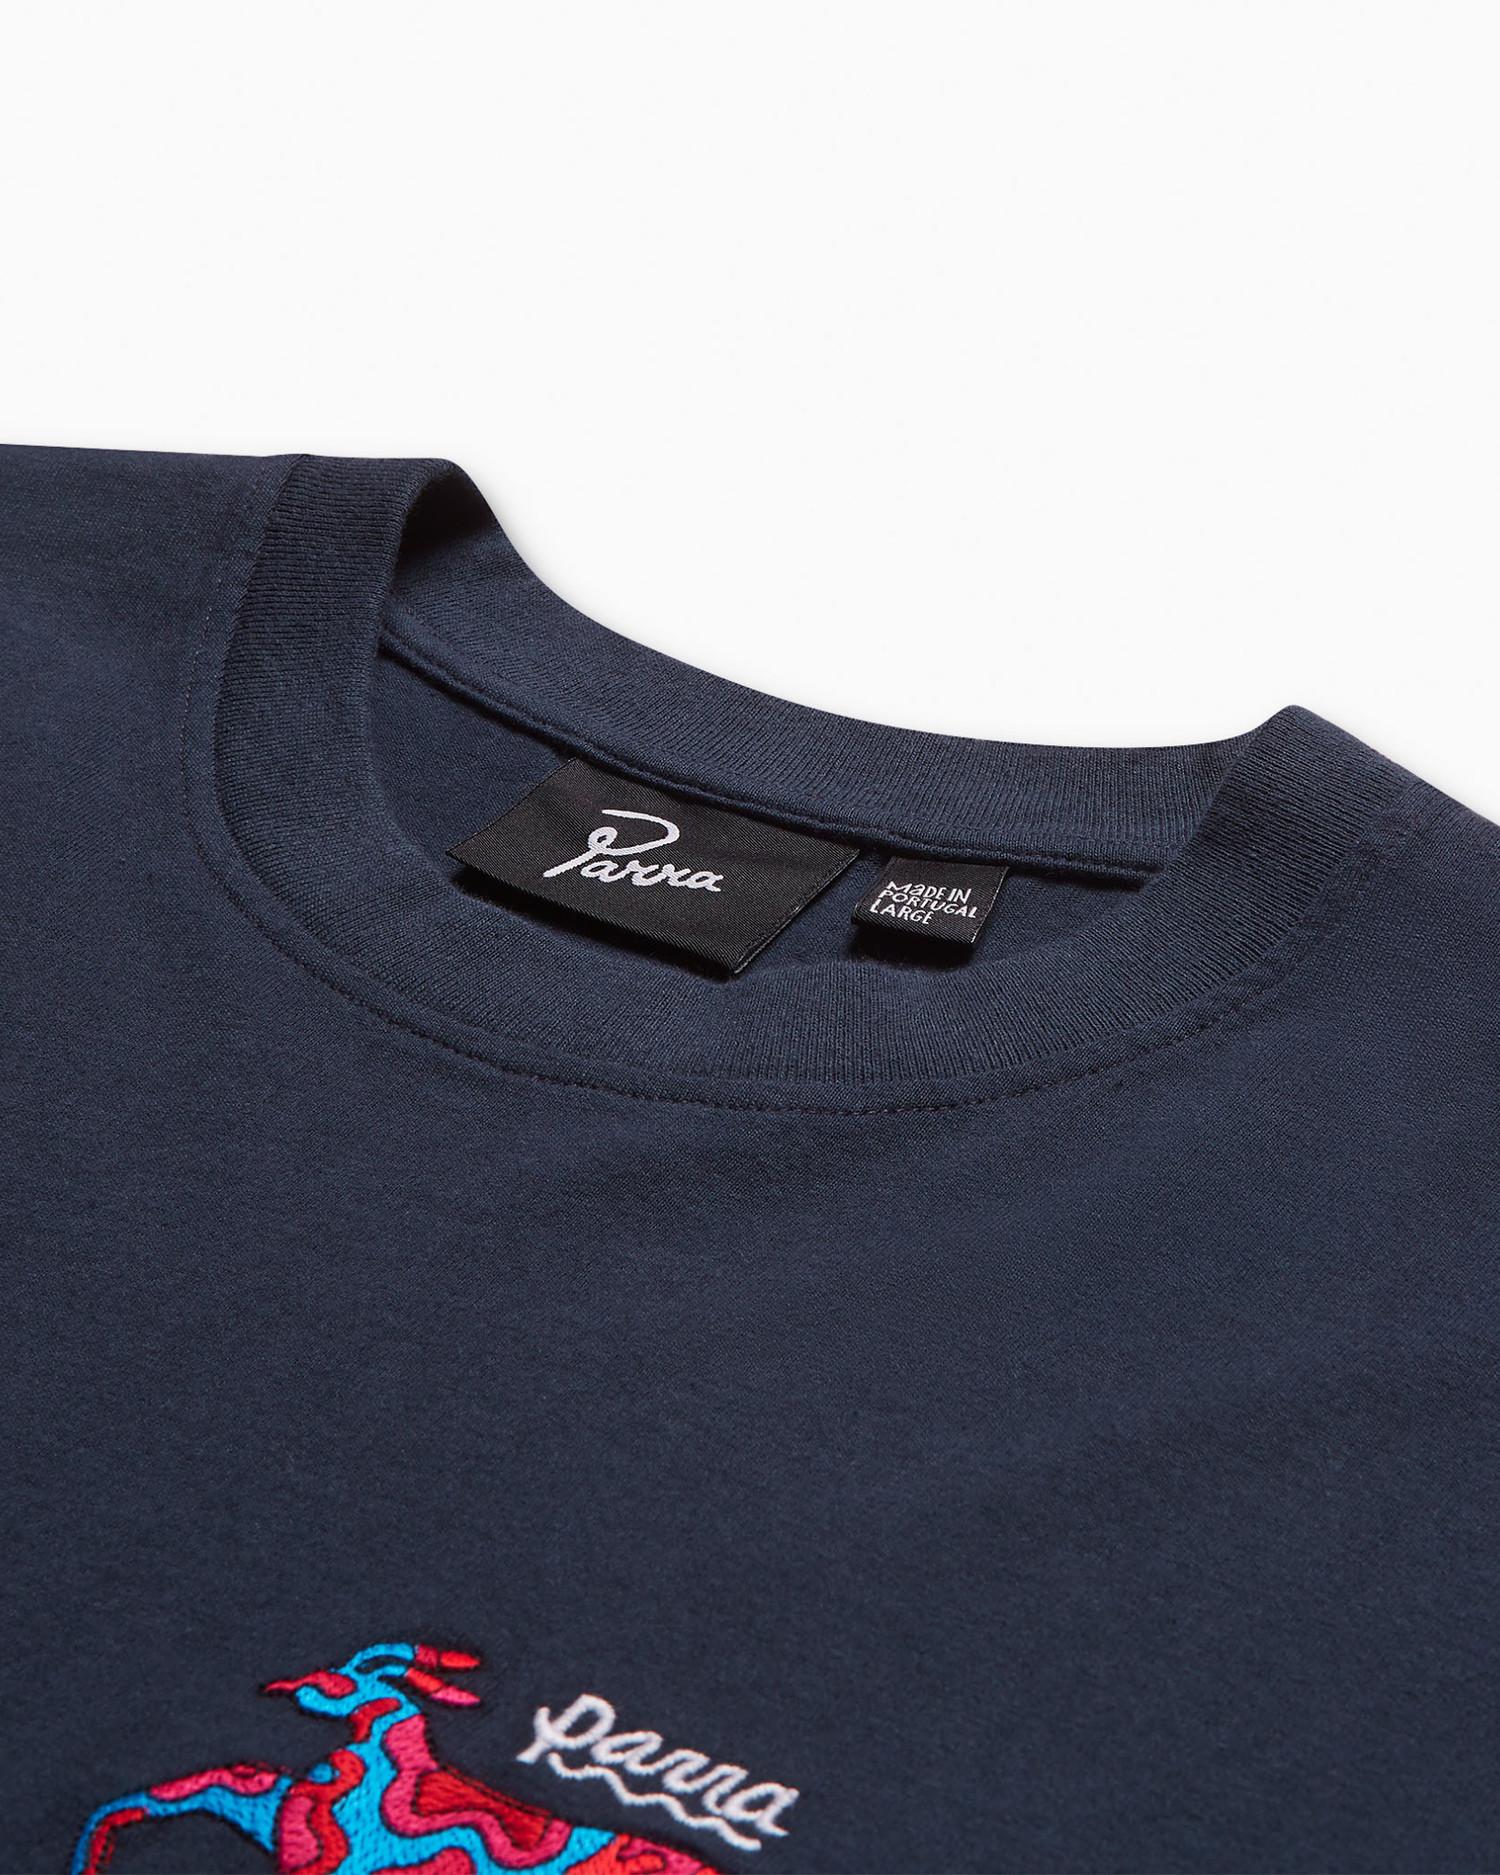 Parra Dog Race T-shirt Navy